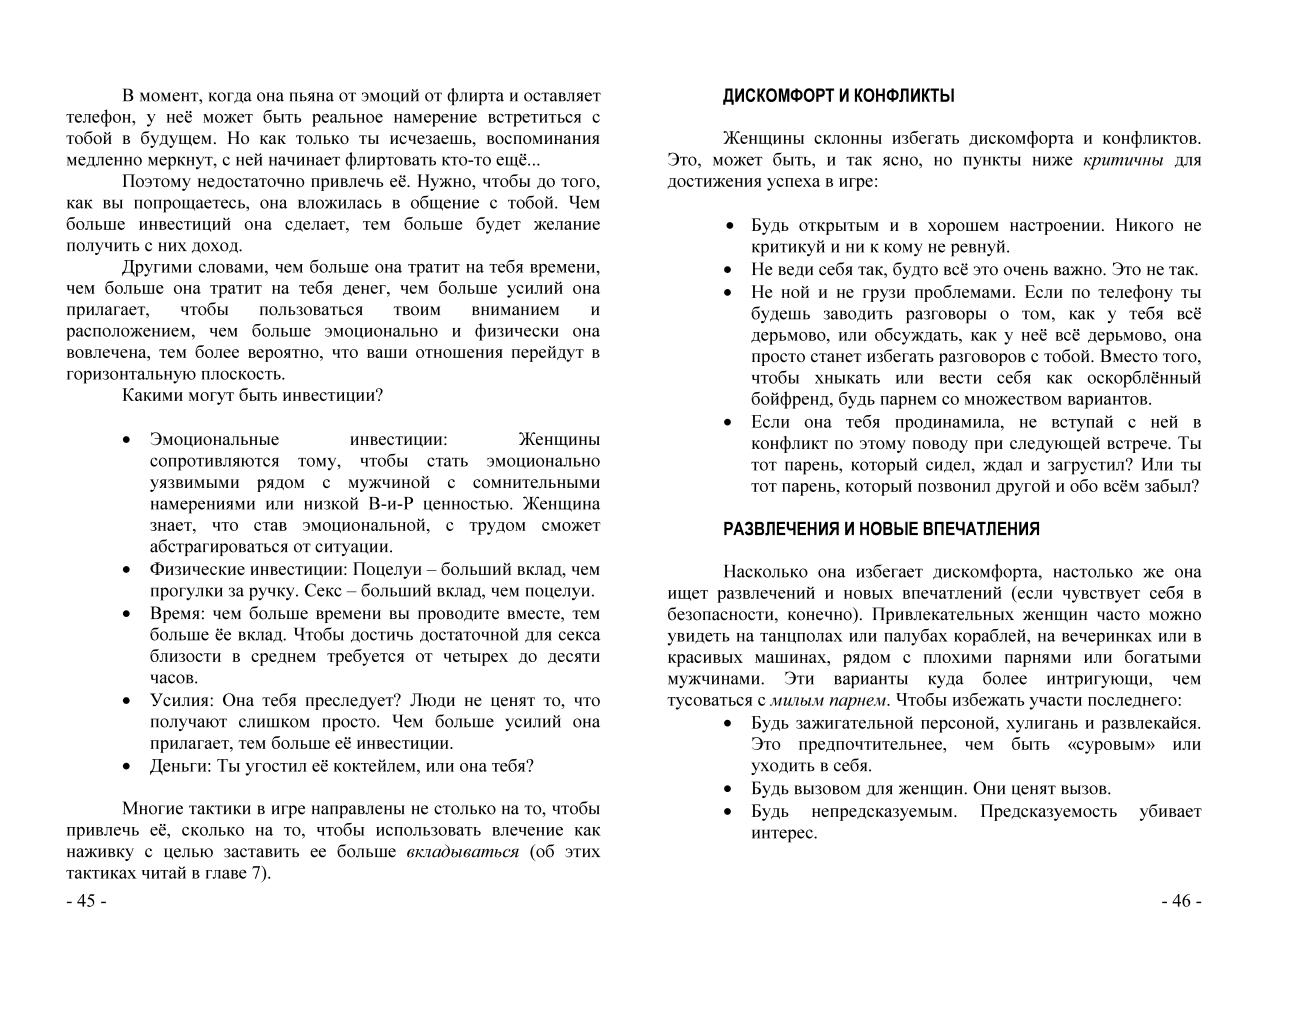 http://i4.imageban.ru/out/2012/02/23/17af1e3ac9092a0eb2a86ac08e8a7b94.png